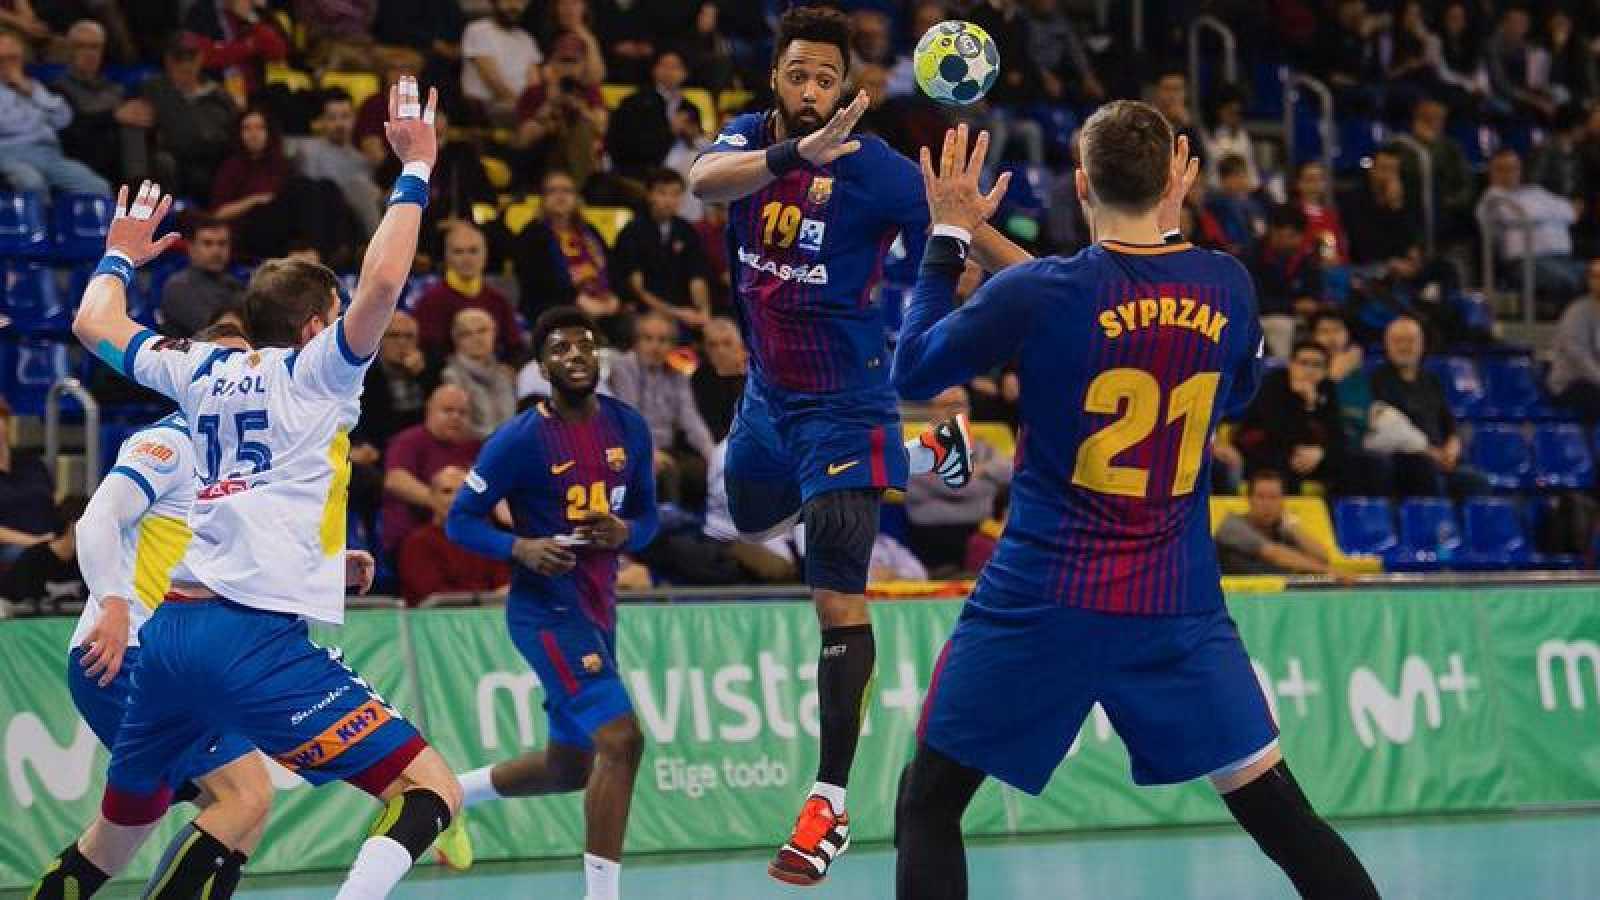 El Barcelona desbanca al Real Madrid del liderato de La Liga